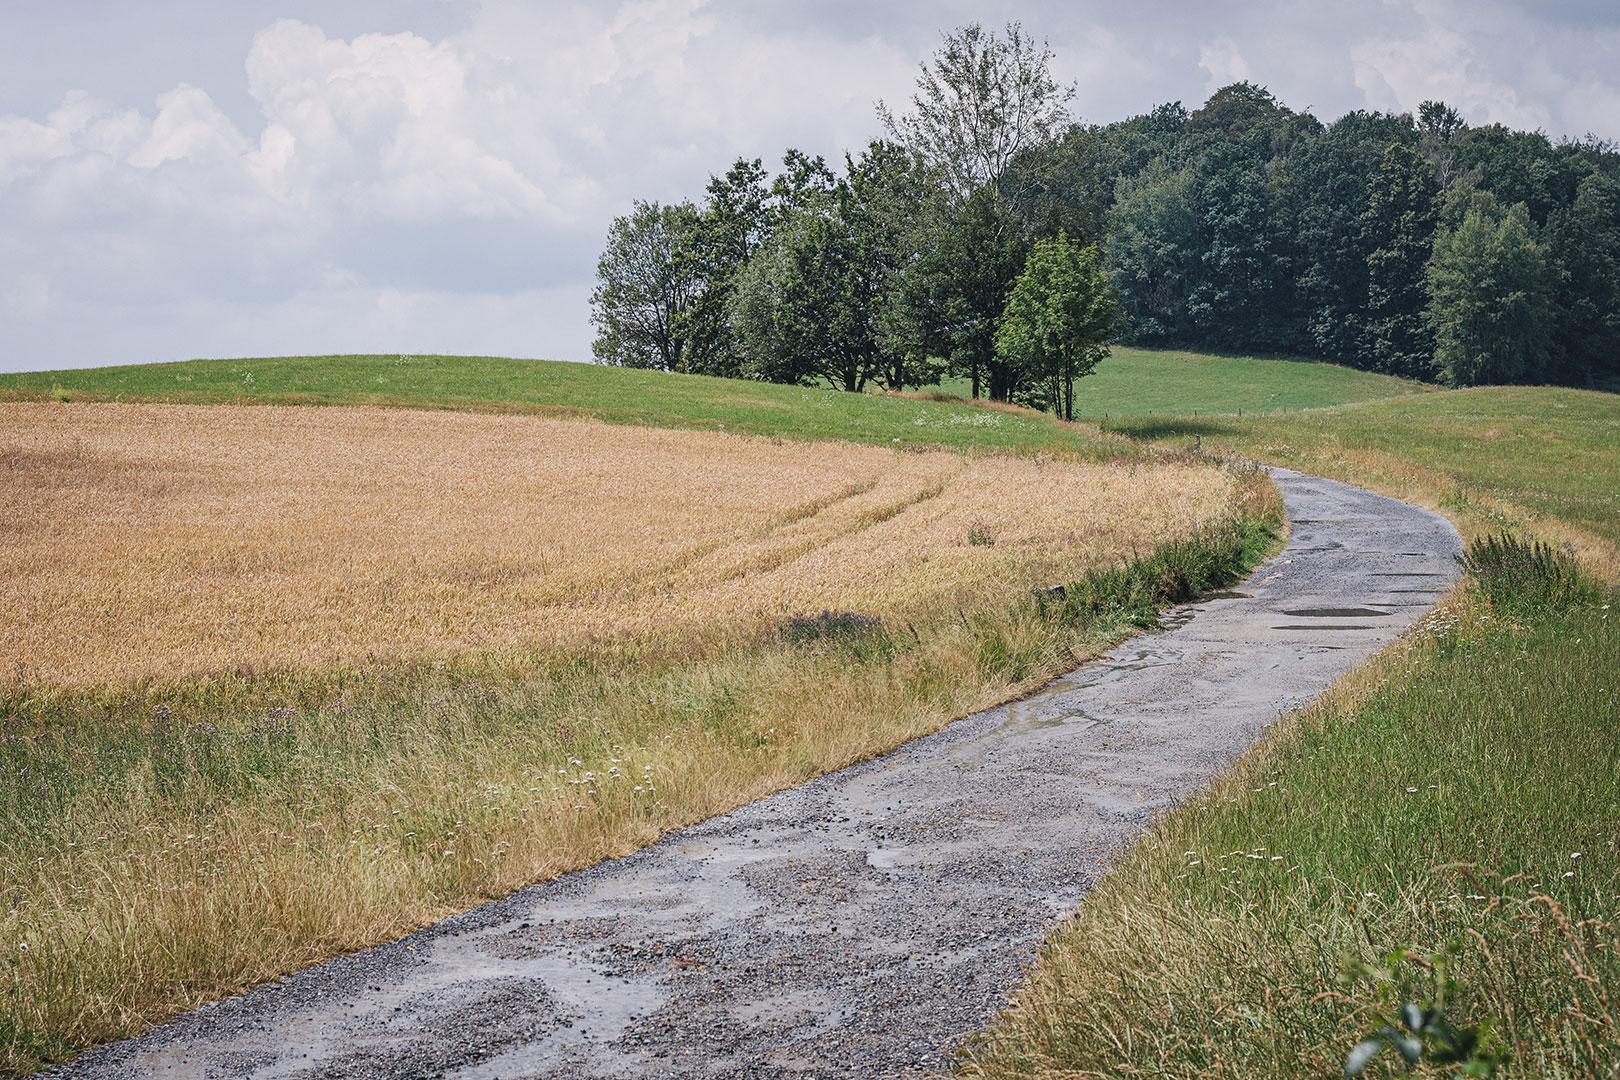 Weg und Feld in Hertigswalde (Drehort Inglourious Basterds)